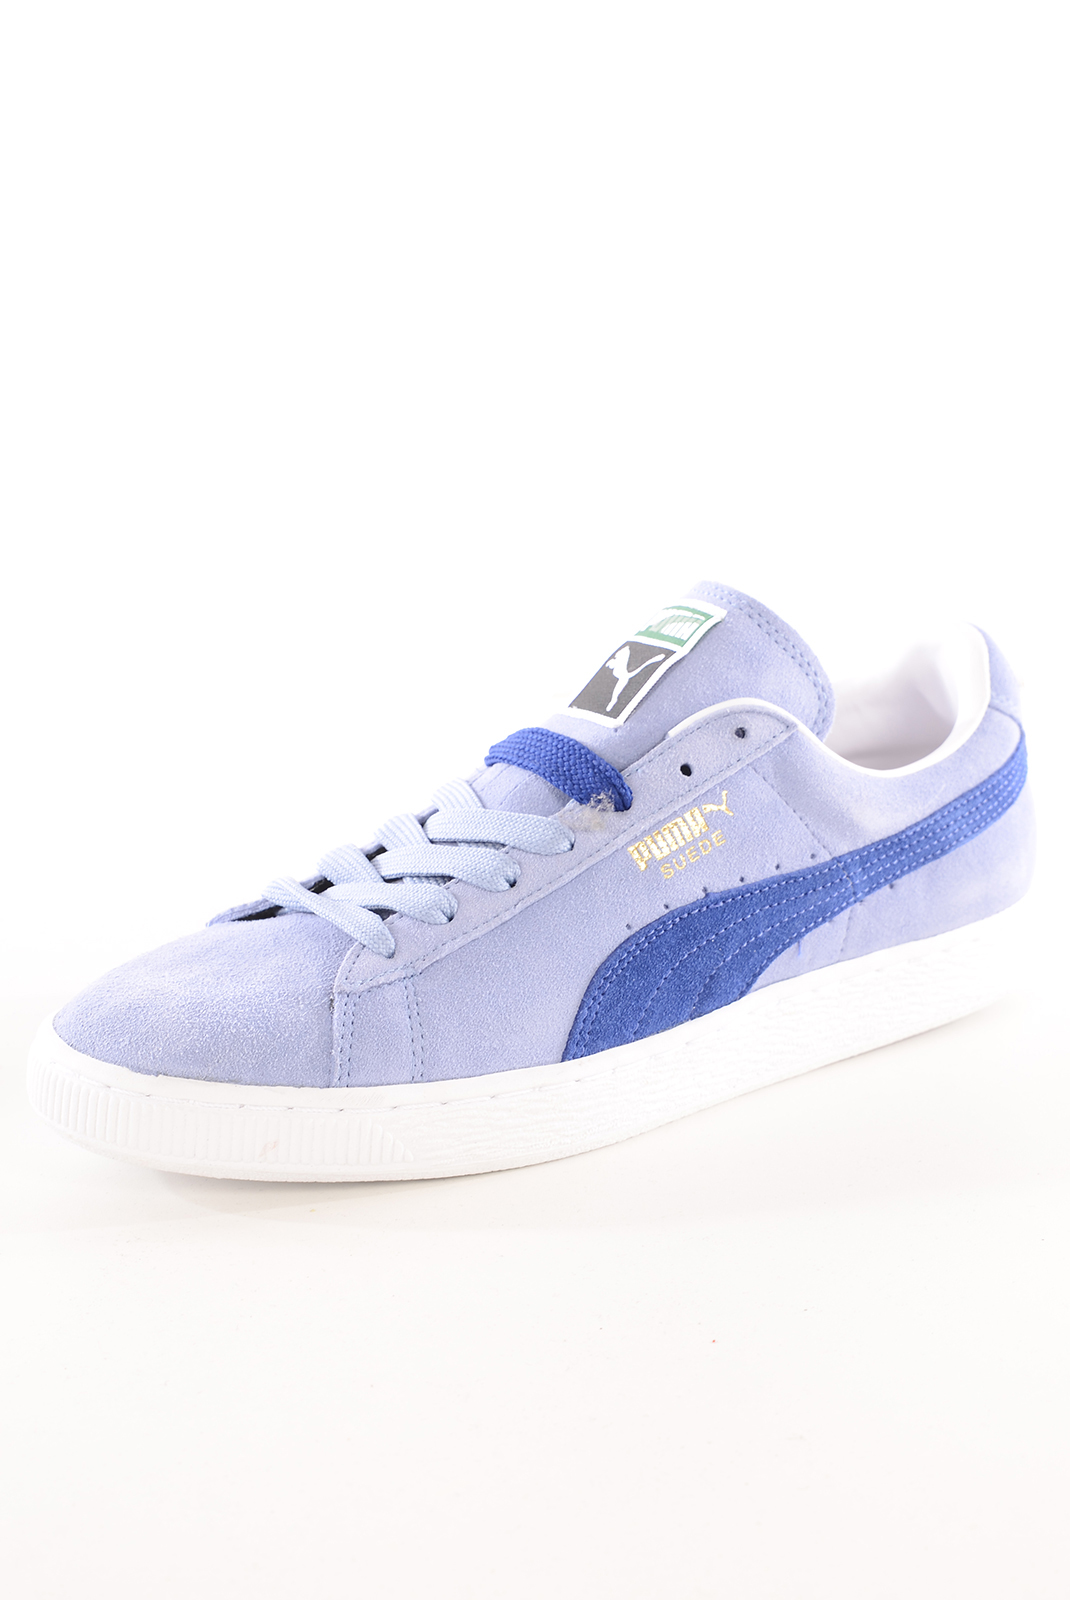 Chaussures   Puma 352634 SUEDE CLASSIC BLEU